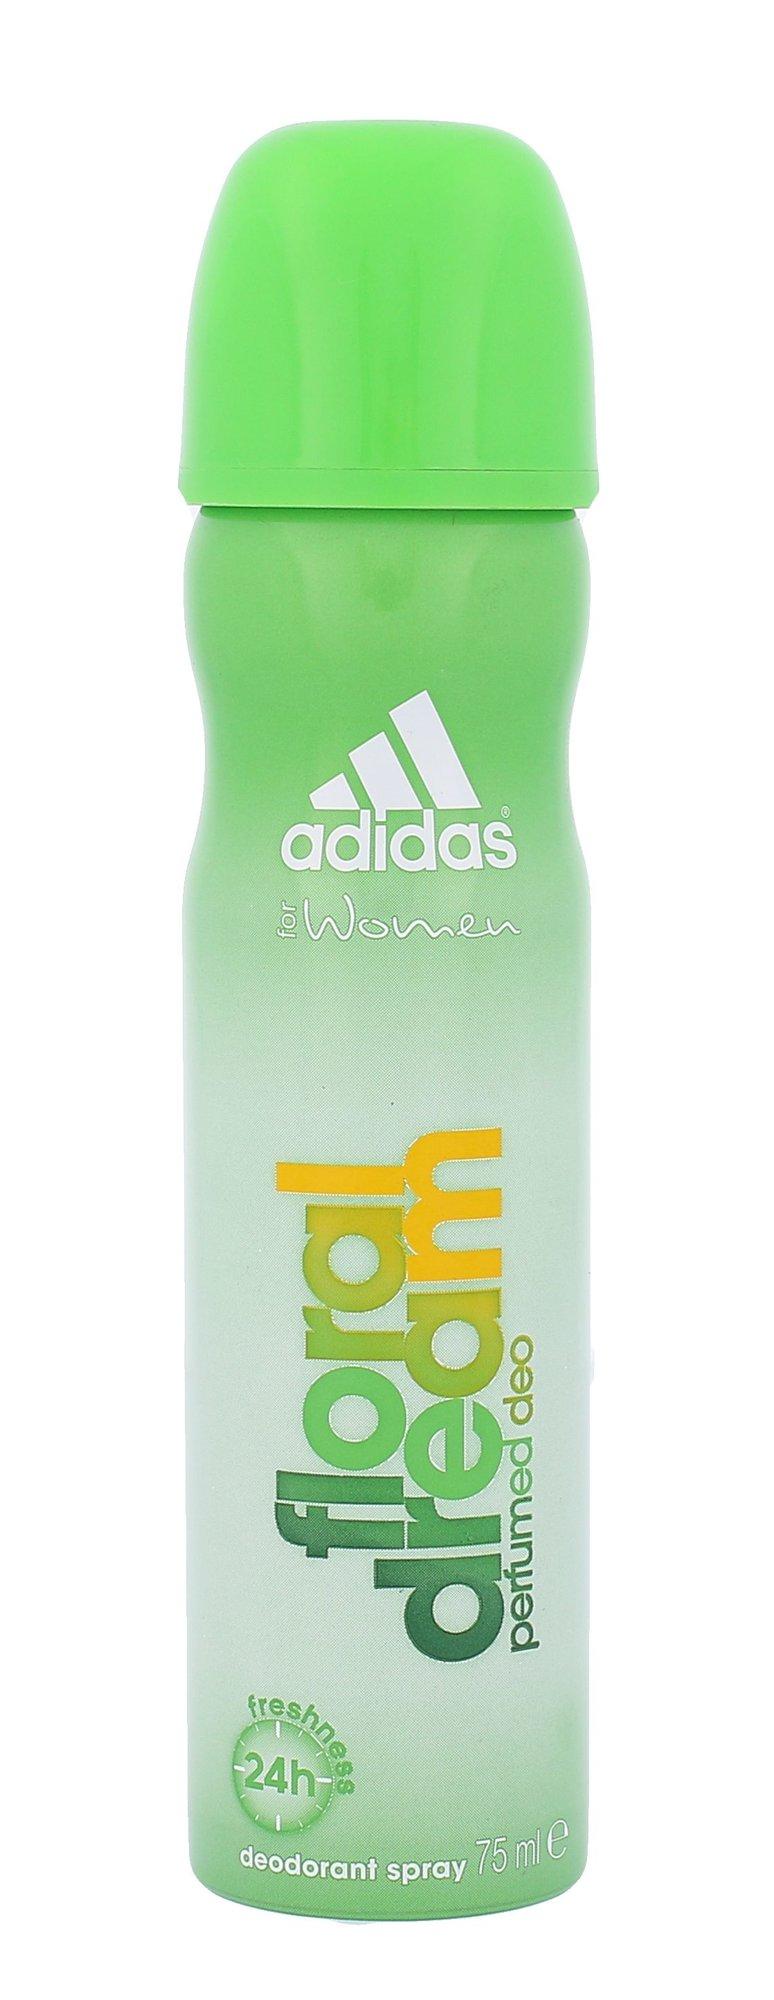 Adidas Floral Dream For Women Deodorant 75ml